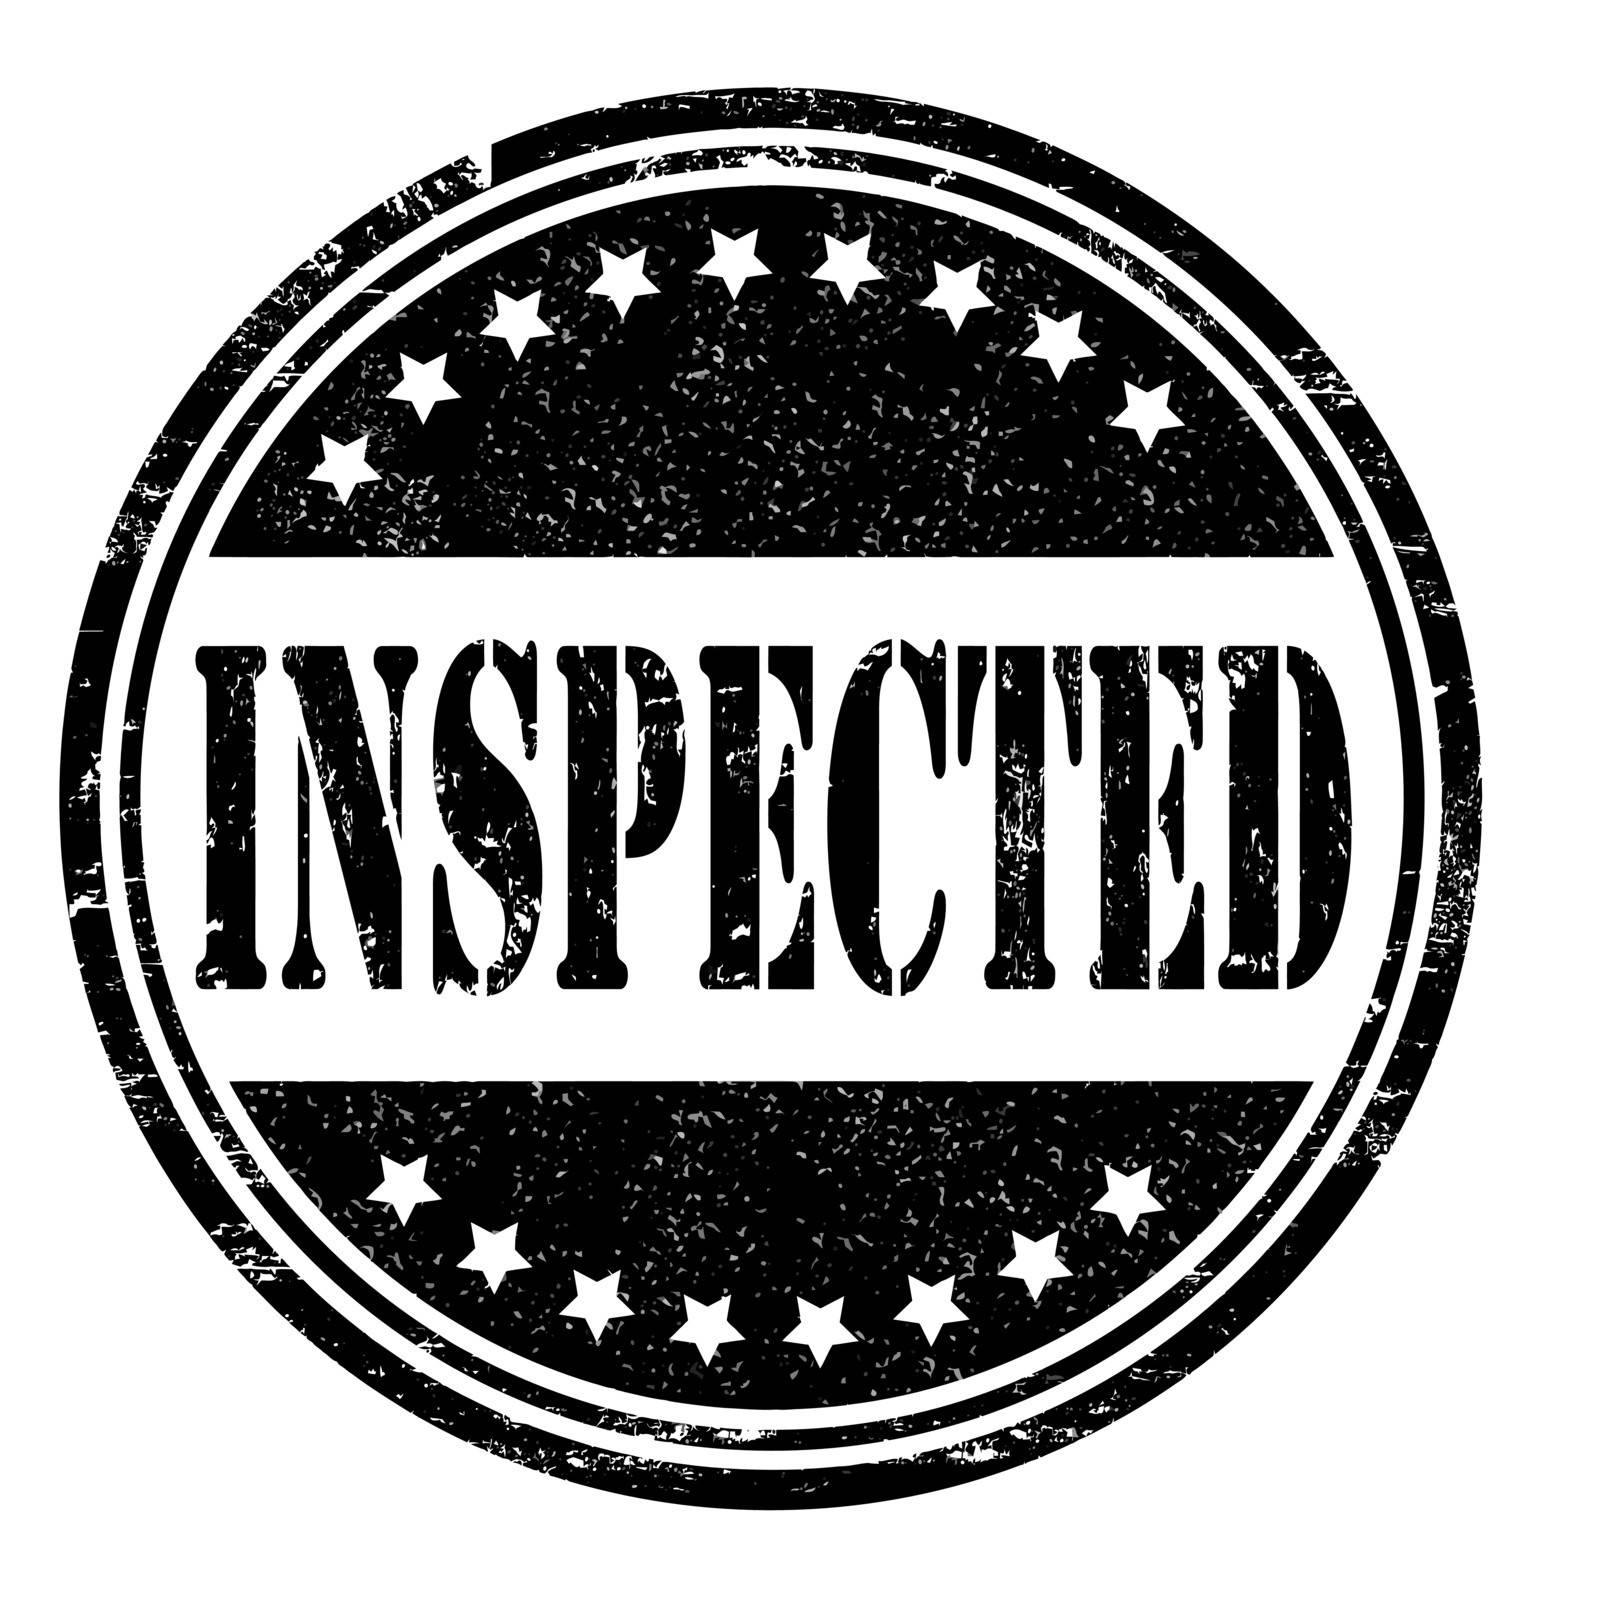 Inspected grunge rubber stamp on white, vector illustration